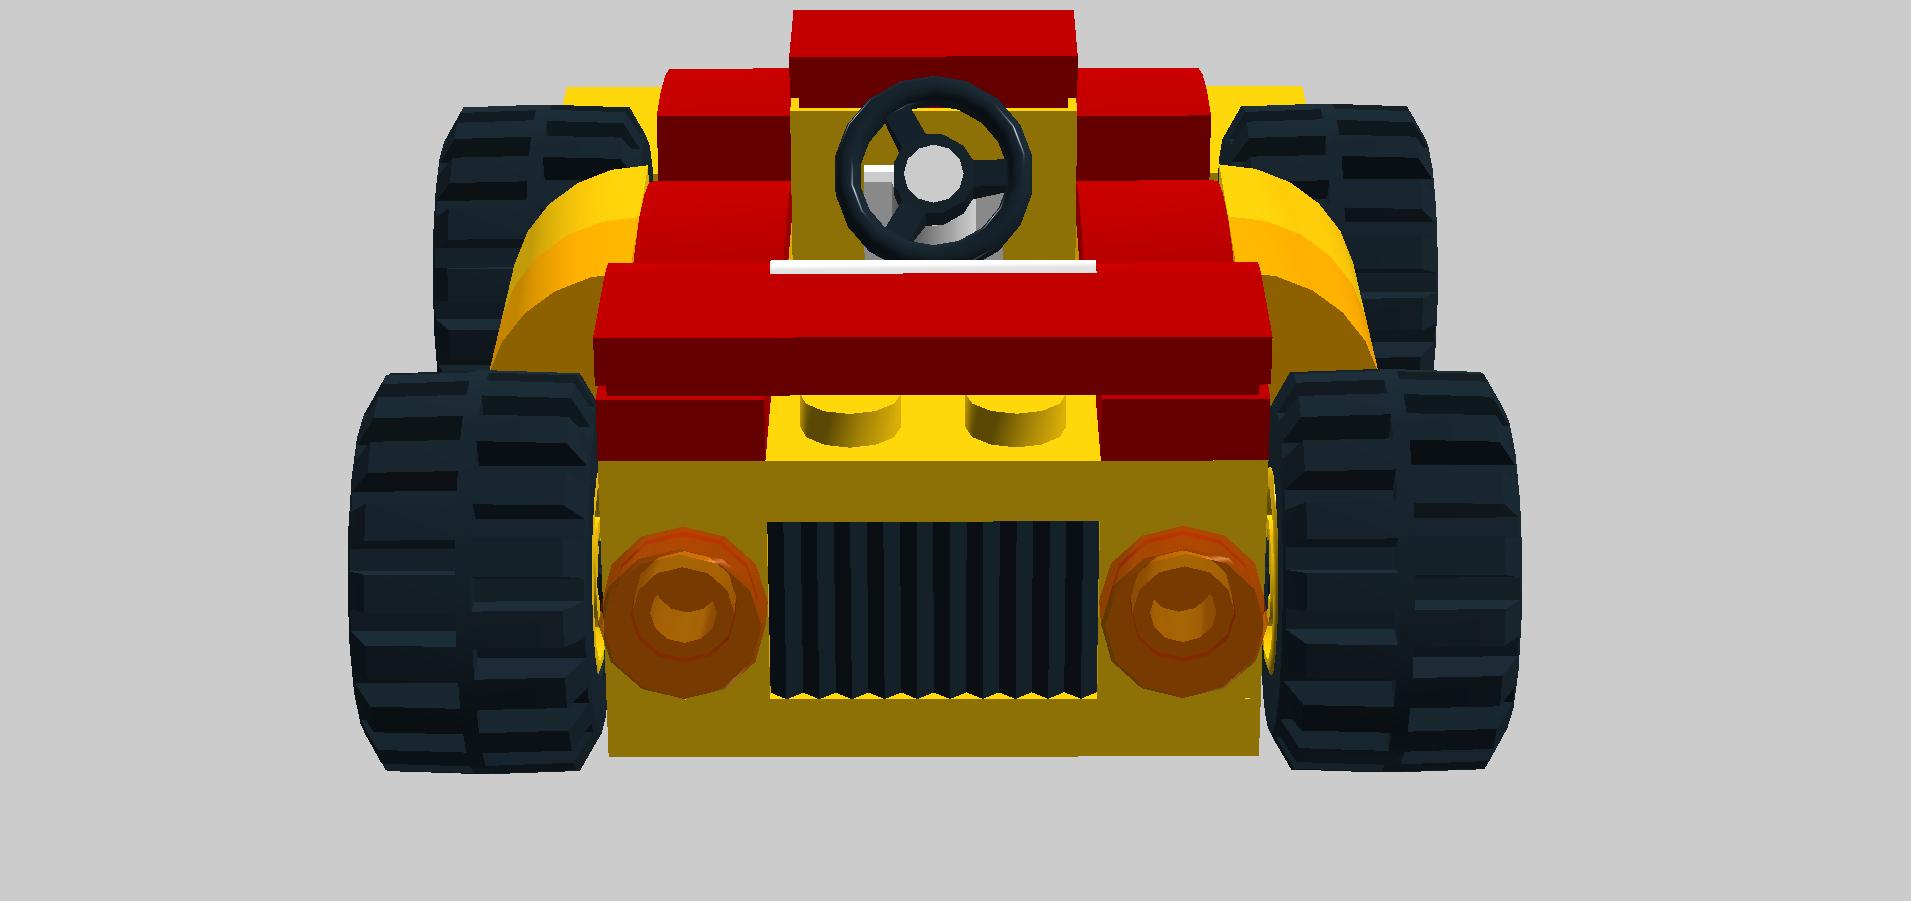 Lego car clipart free download MK Cartoon Gocart - Bricksafe free download